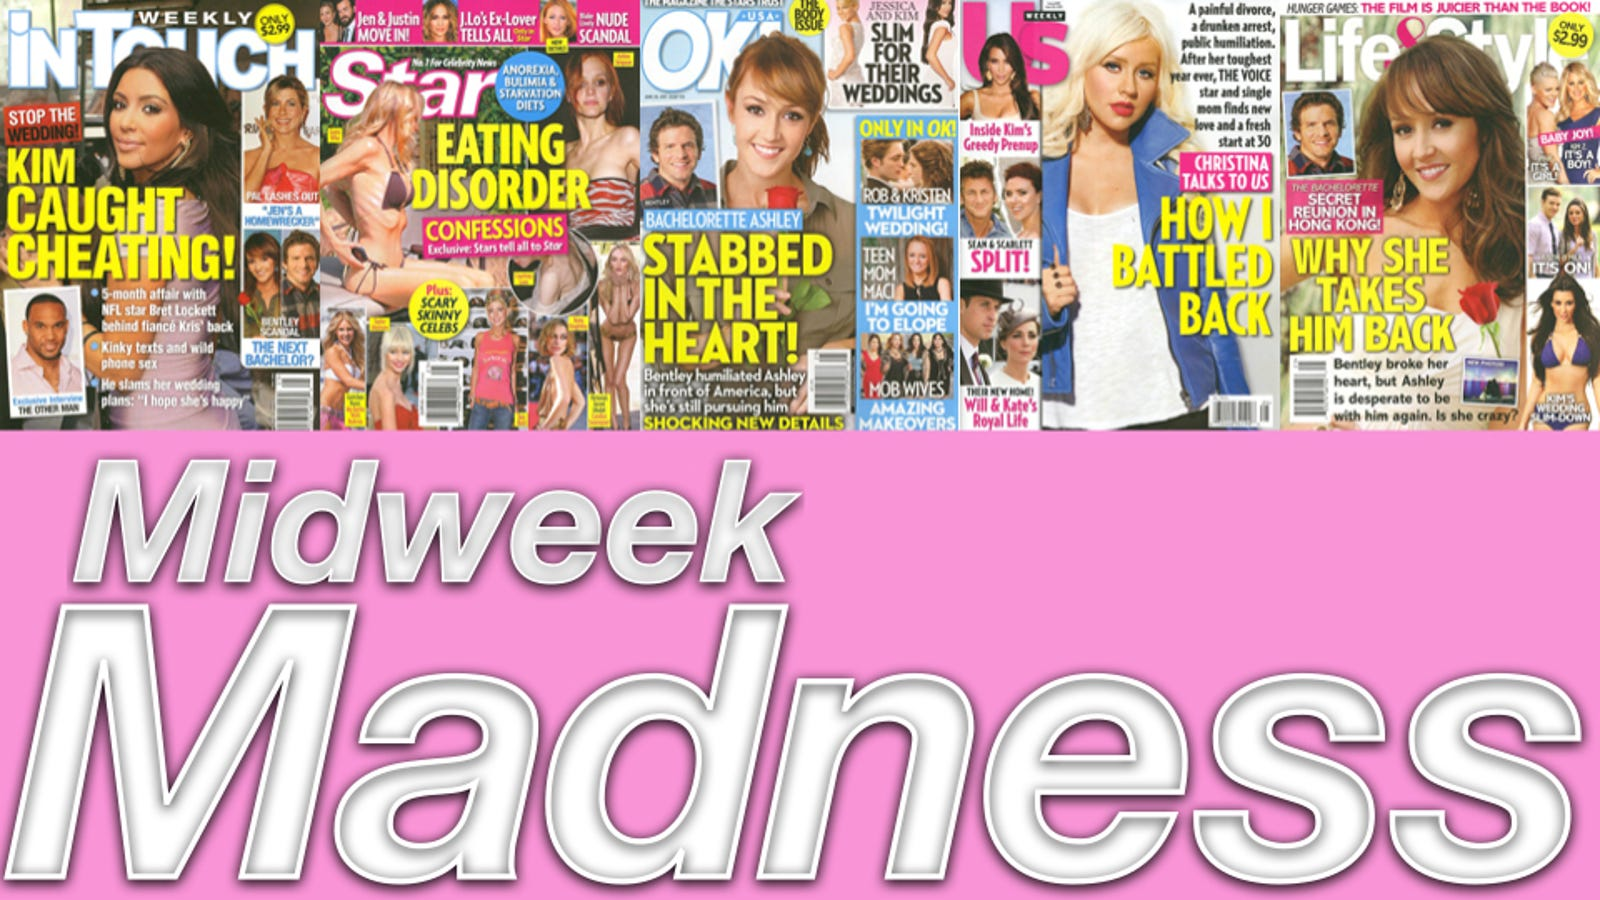 This Week In Tabloids: Kim Kardashian Had Phone Sex With A ...